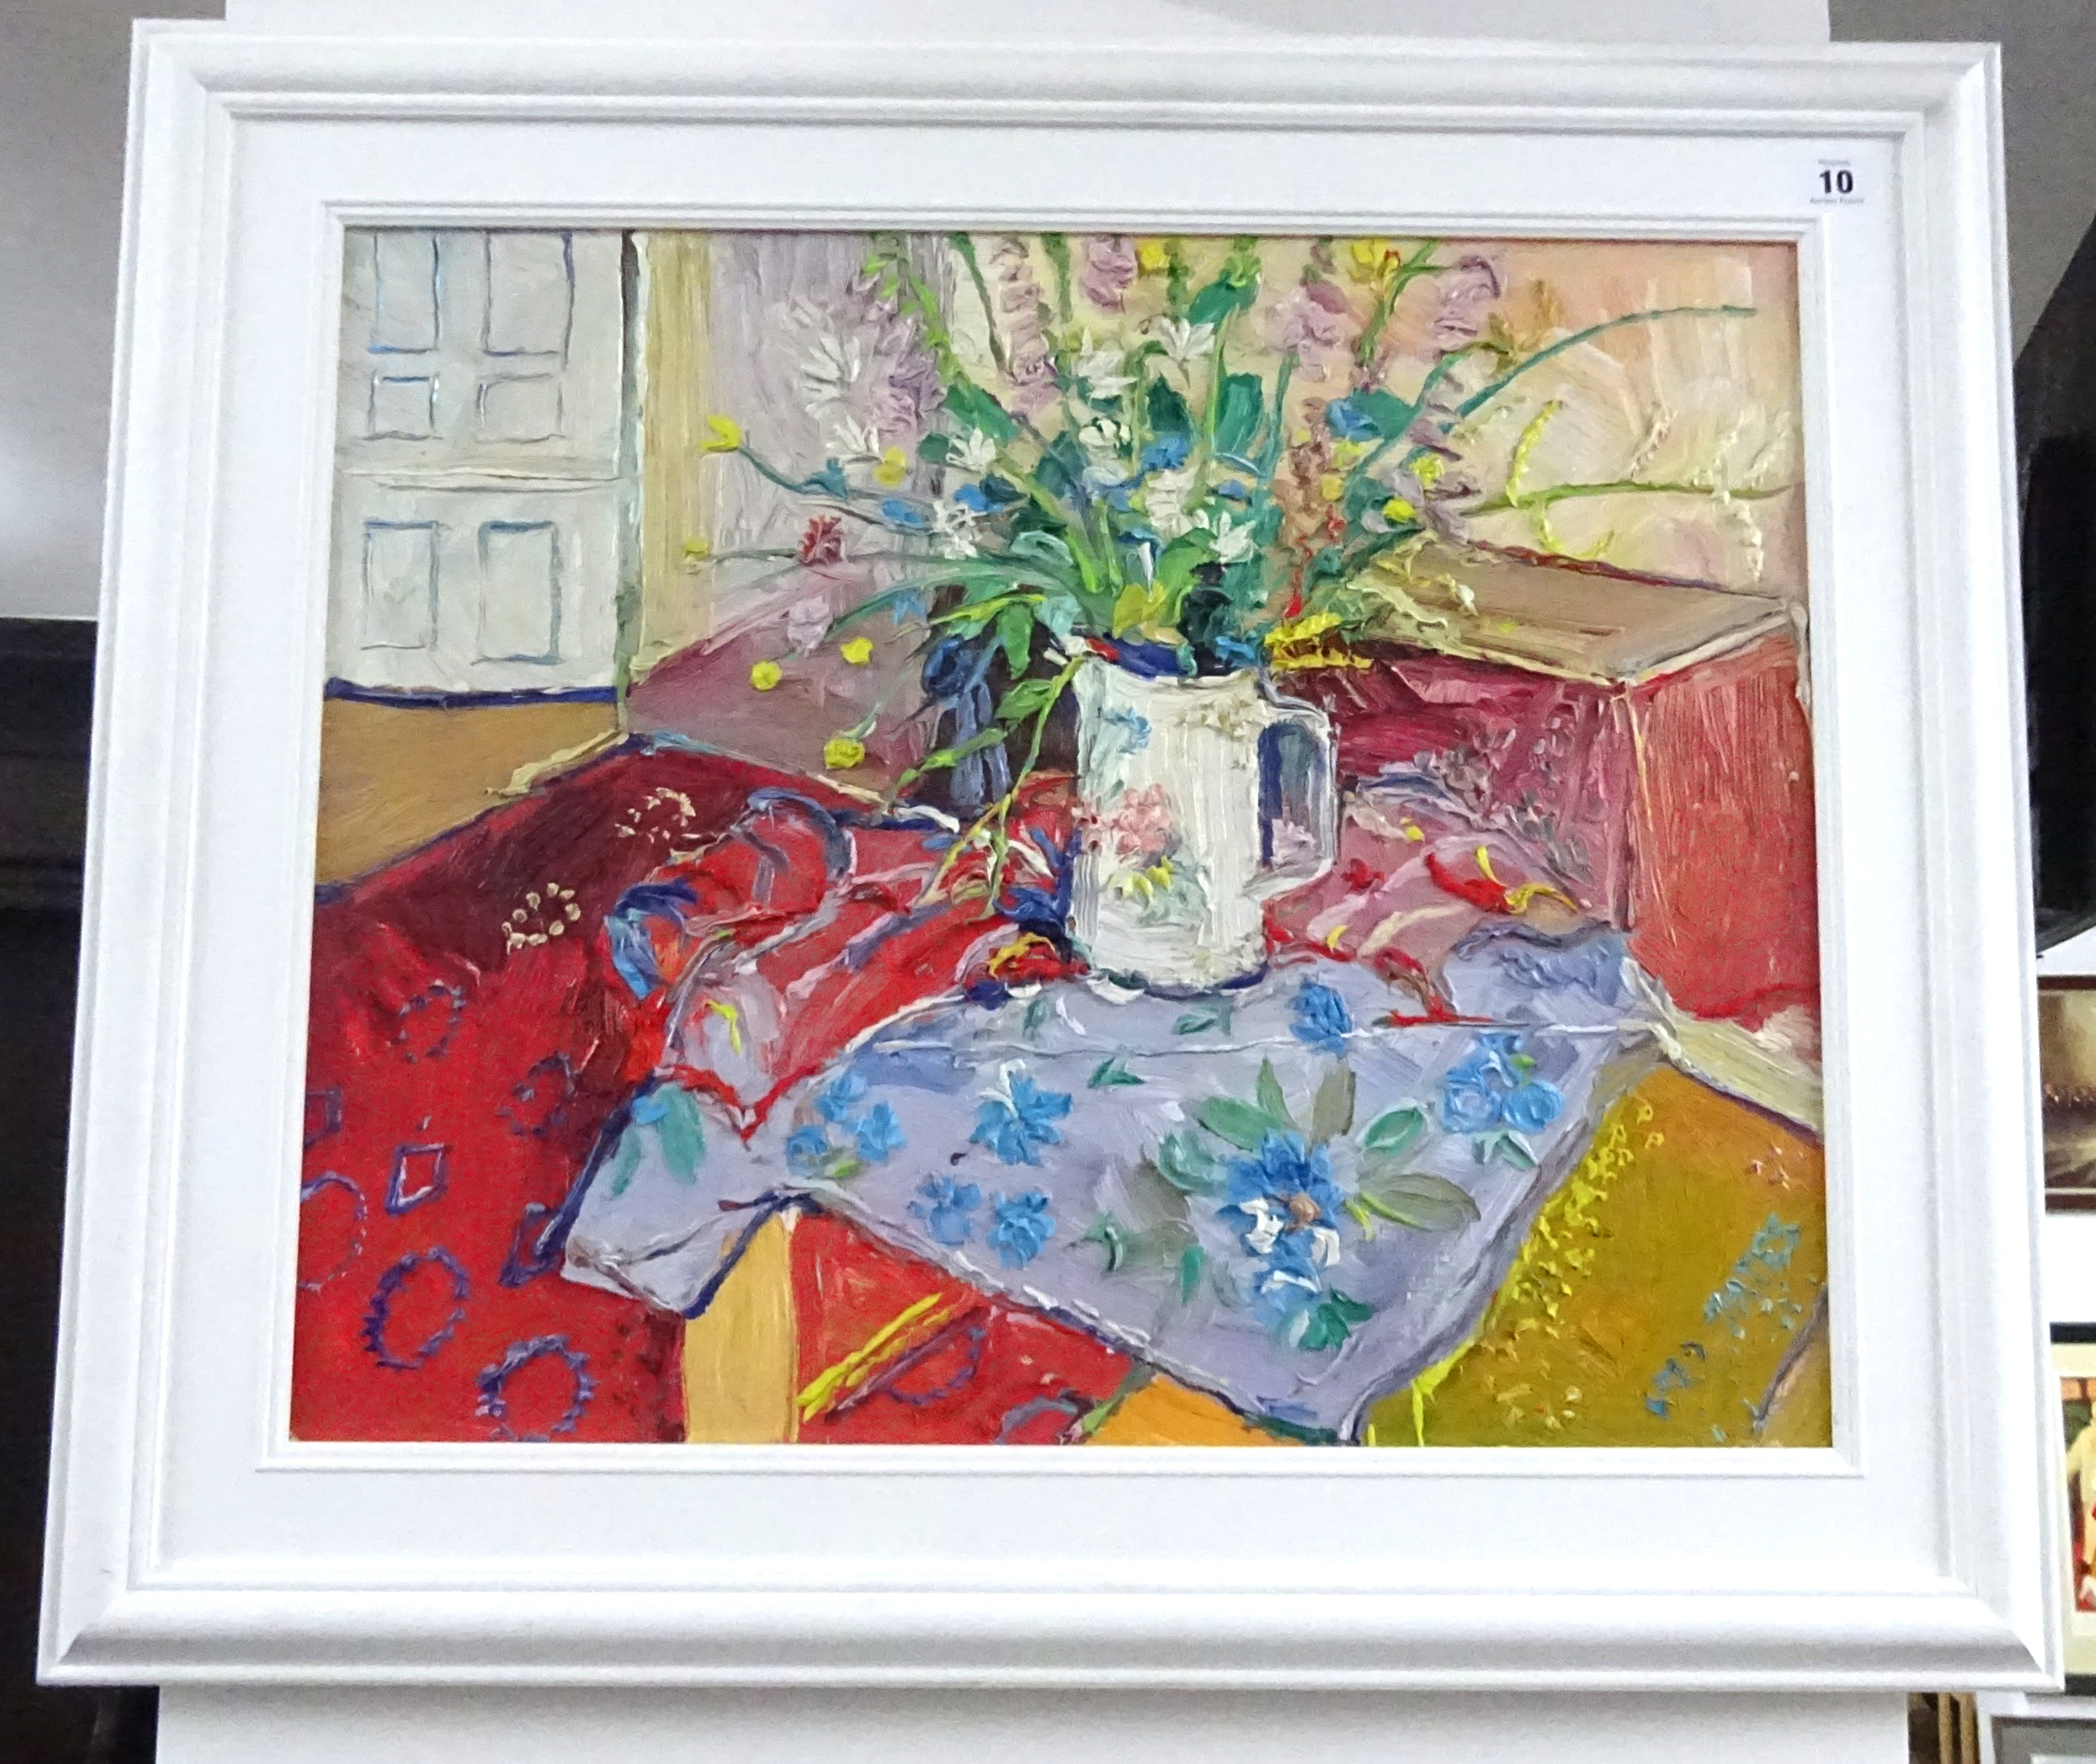 Lot 010 - Fred Yates (1922-2008), oil on canvas 'Still Life', signed, framed, 49cm x 60cm.